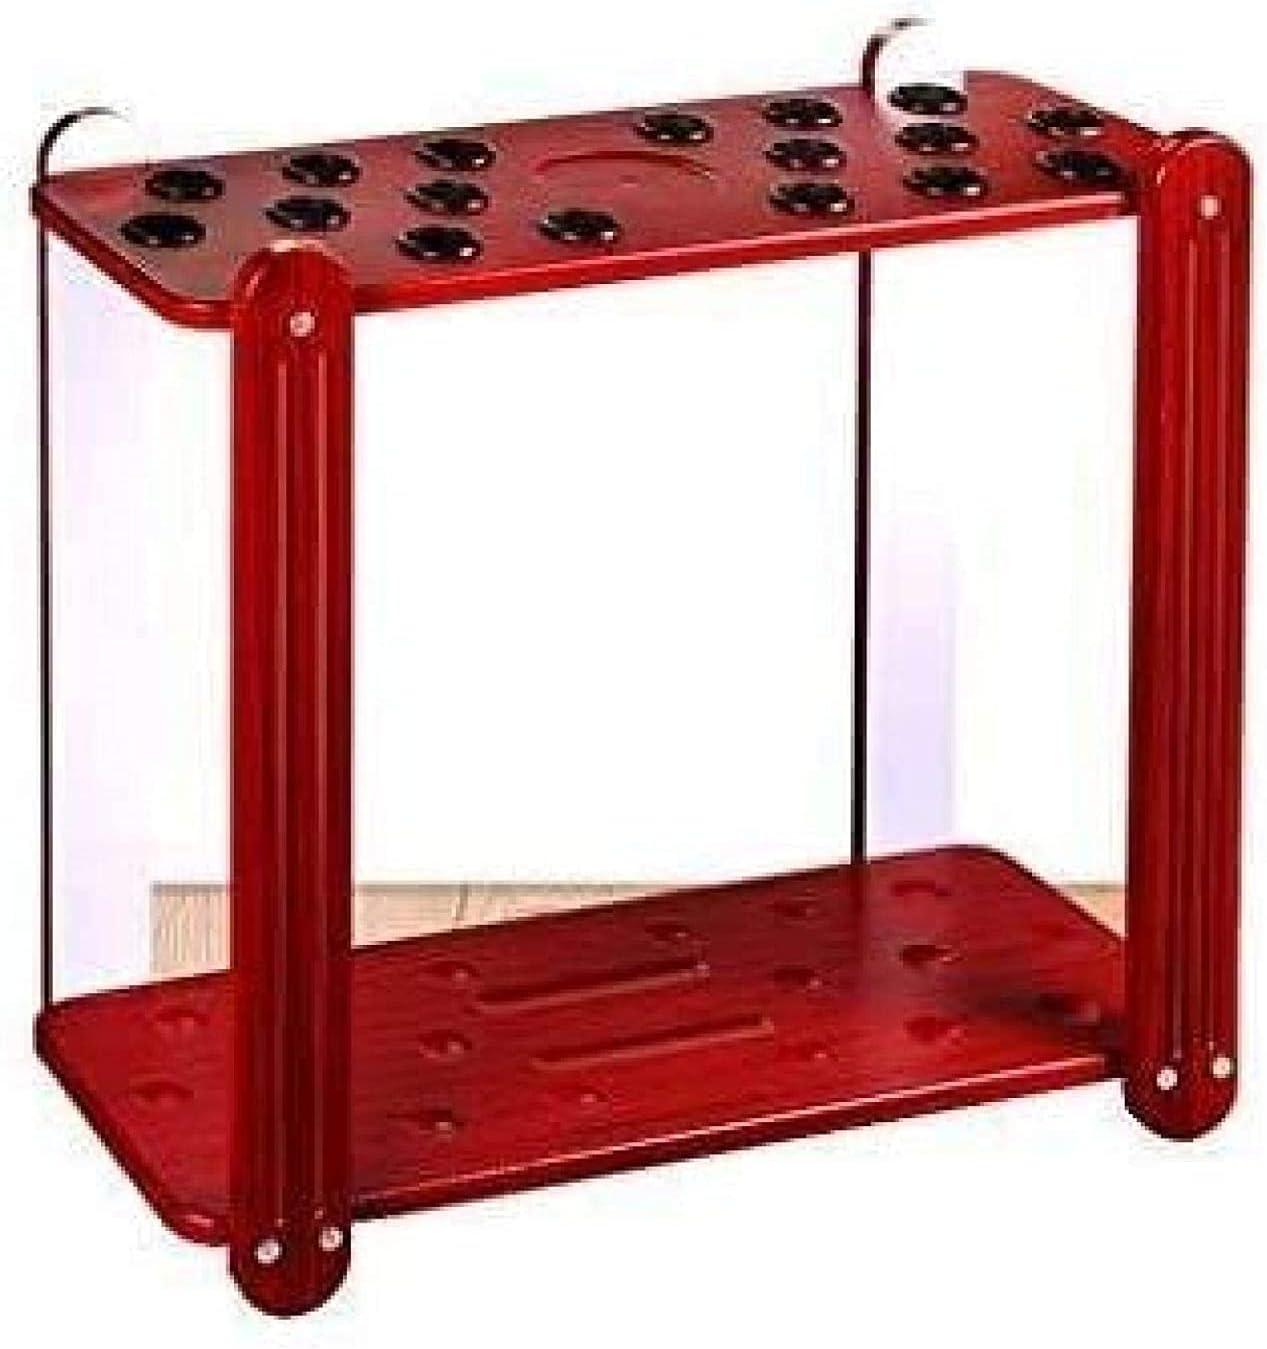 LCBOOST0916 Billiard New sales Cue Storage Pool Holder Rack Stick Inexpensive